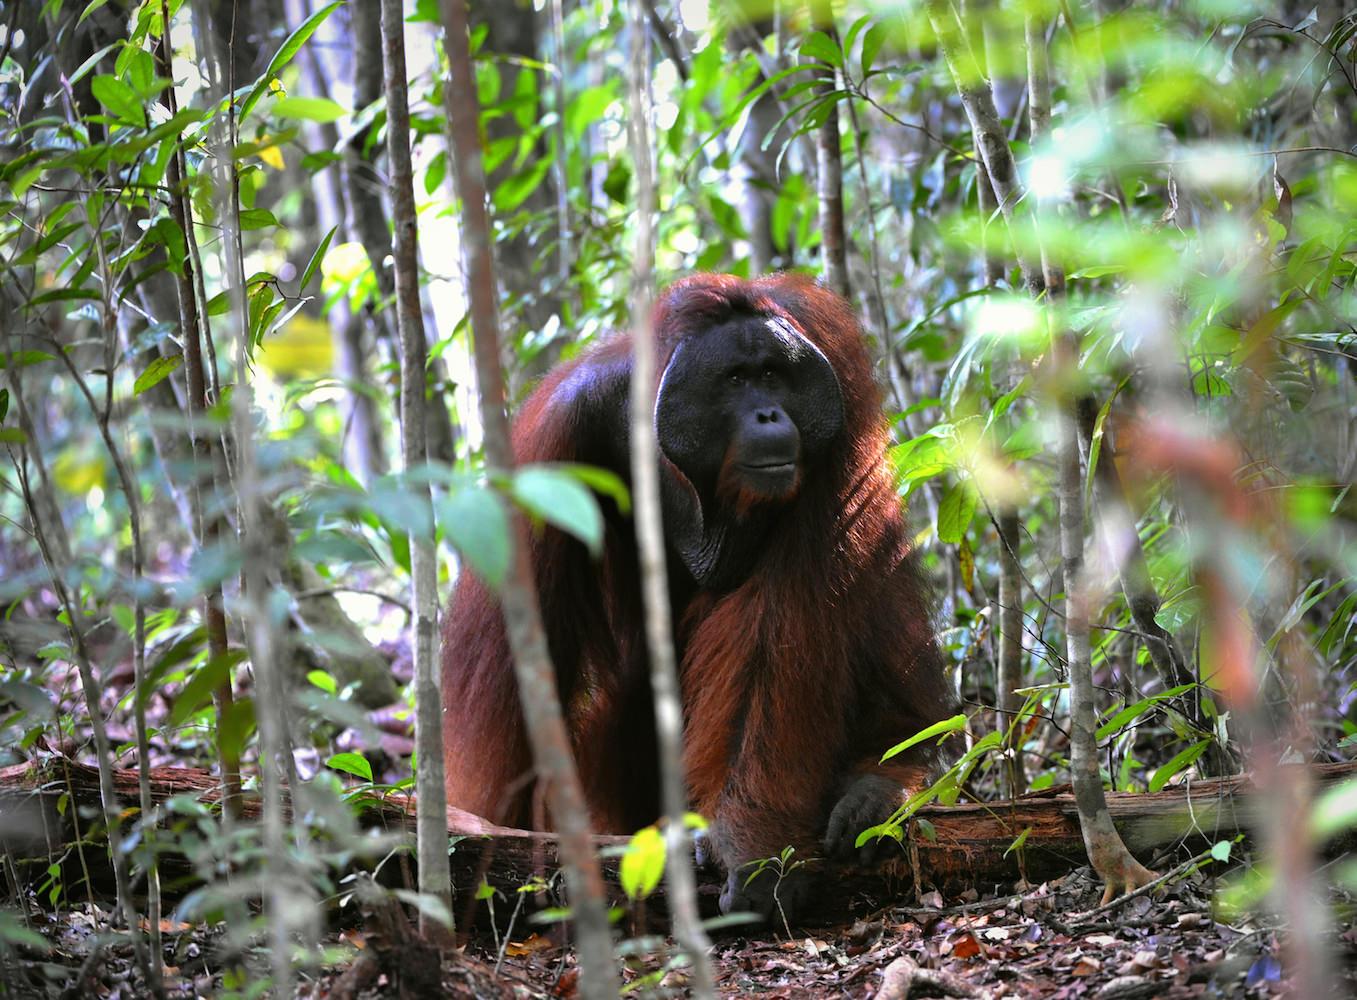 Flanged male orangutan in forest